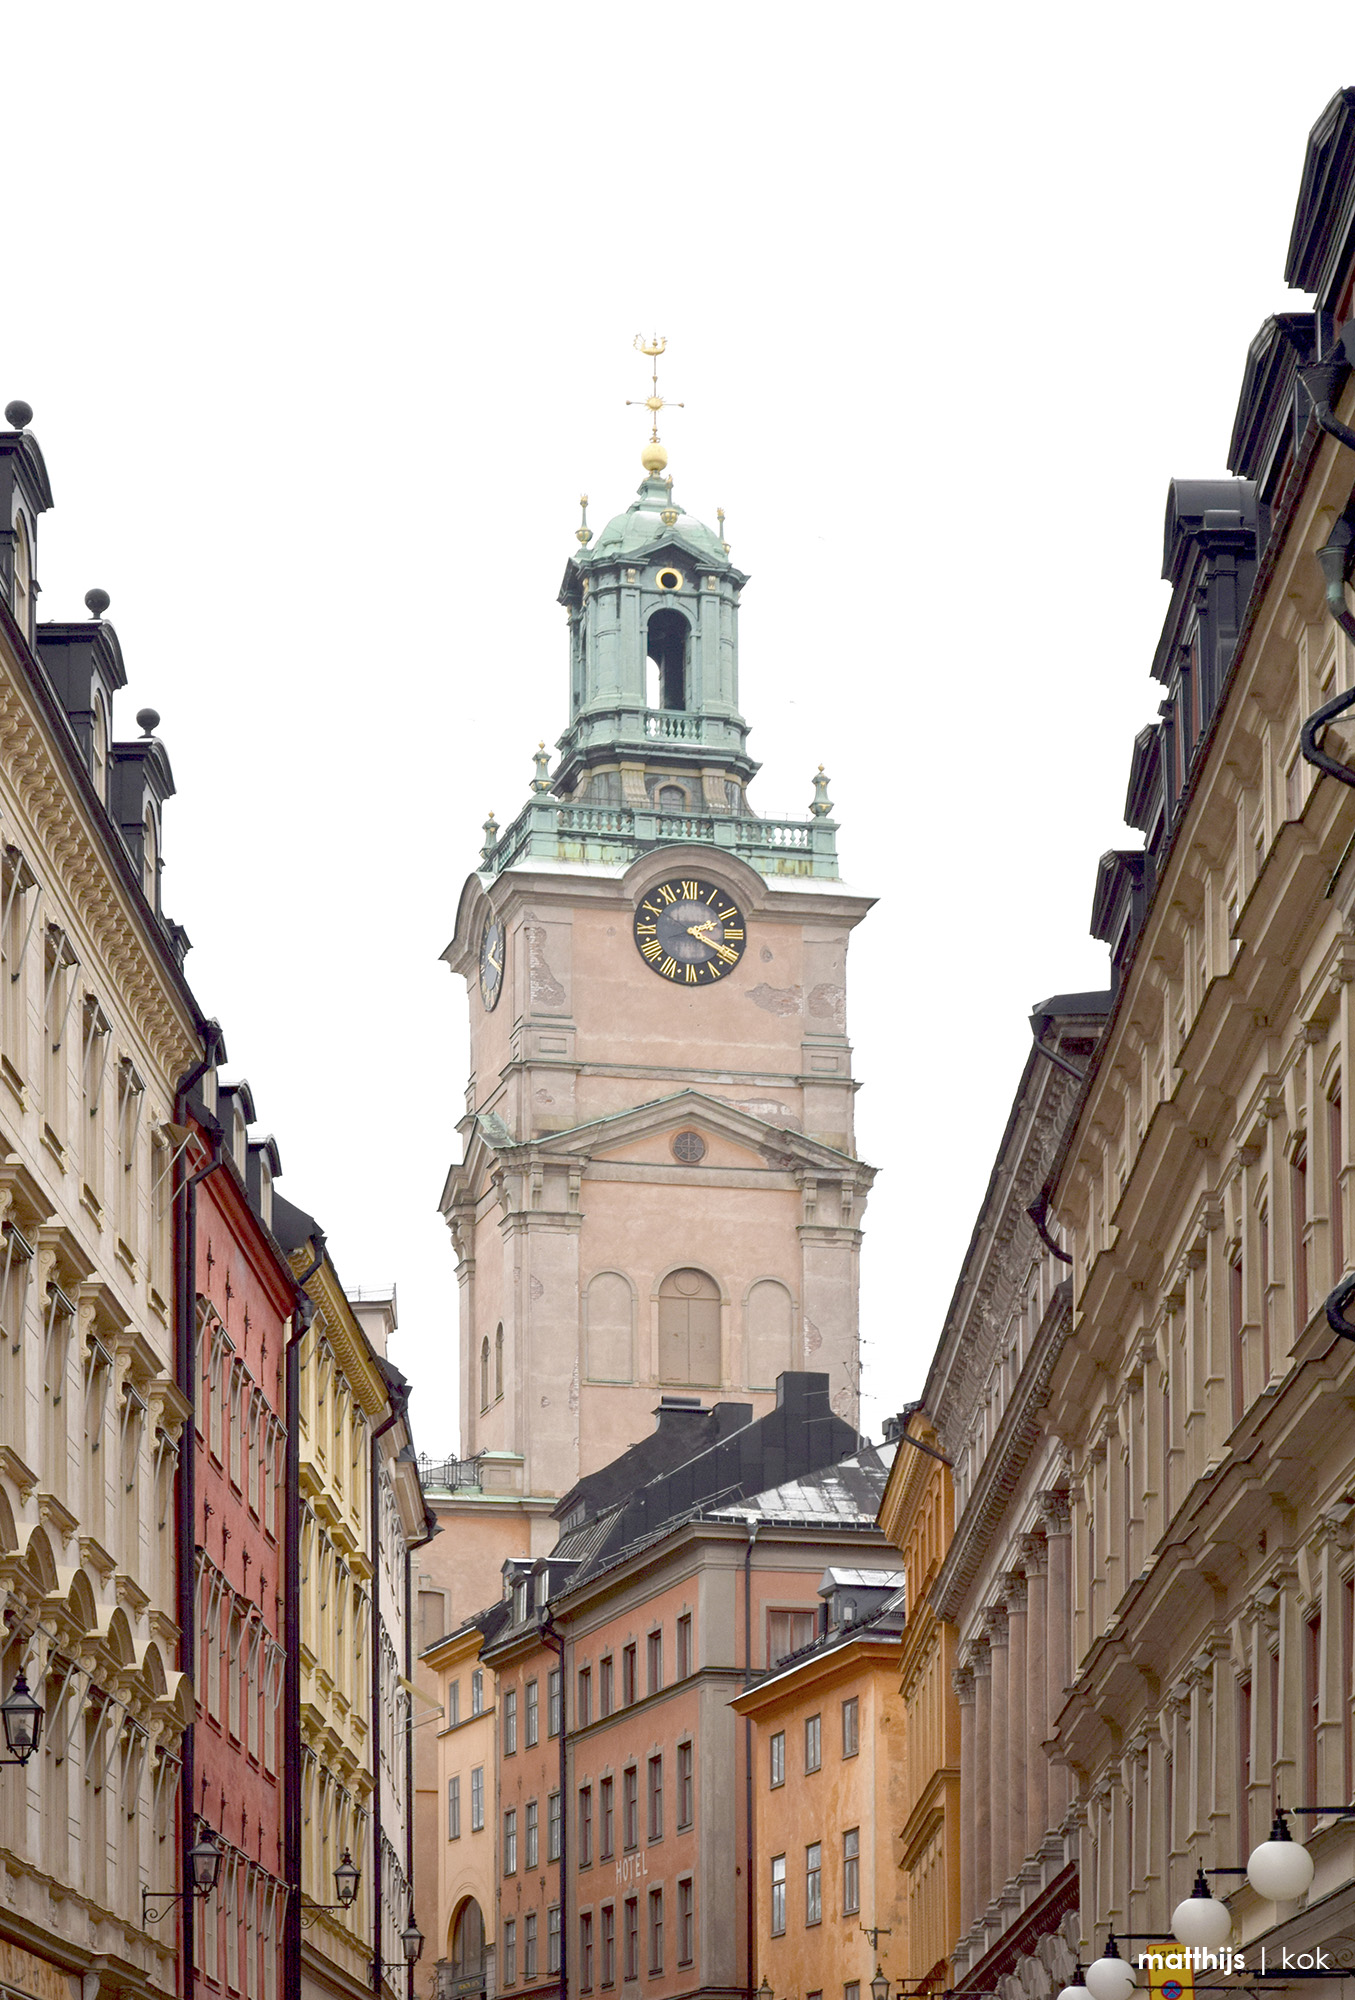 Storkyrkan, Gamla Stan, Stockholm, Sweden | Photo by Matthijs Kok